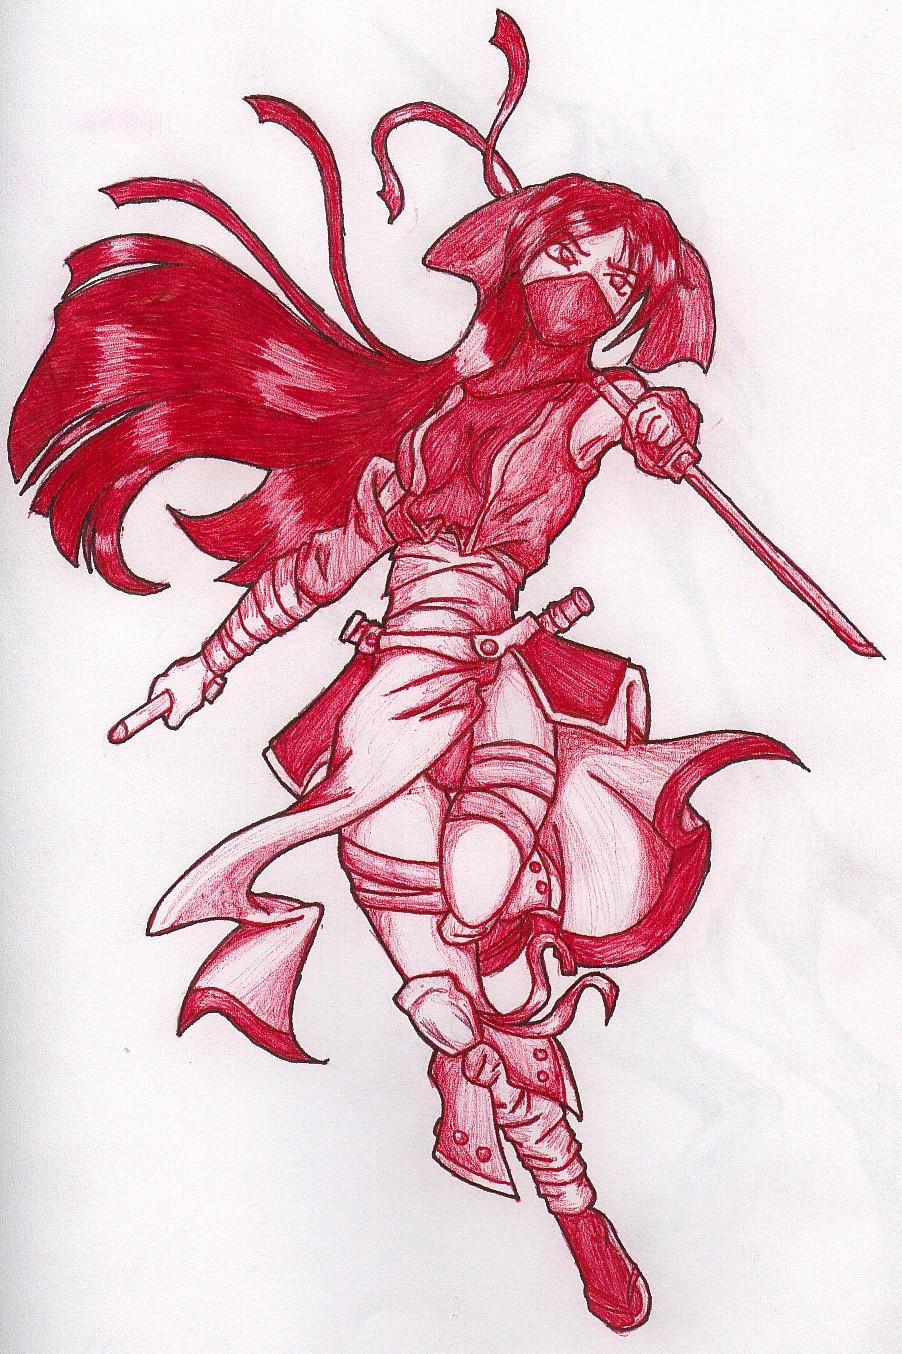 Ninja Lady by Karkahn